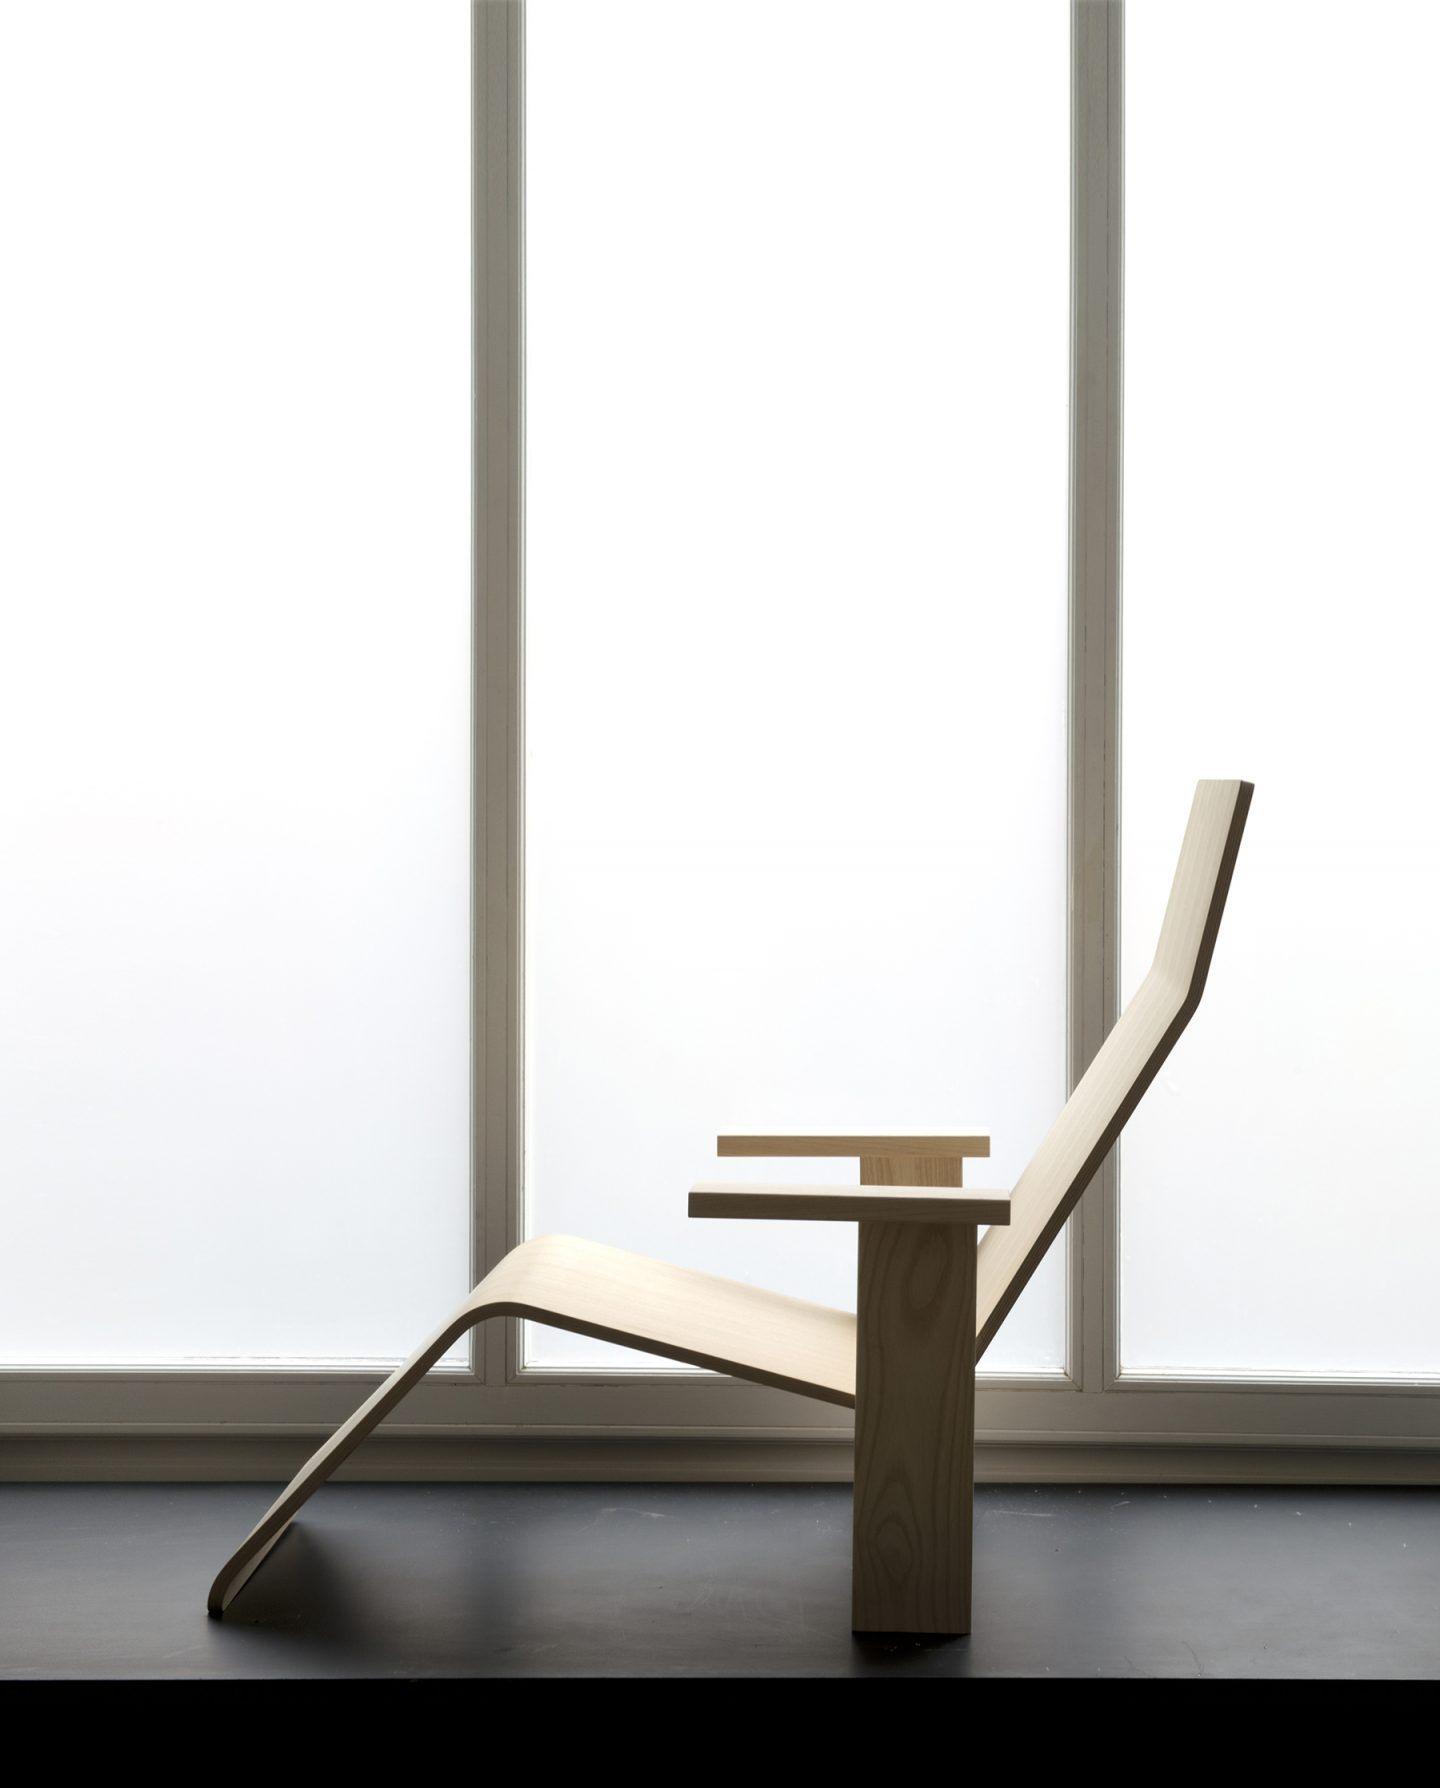 IGNANT-Design-Ronan-And-Erwan-Bouroullec-Quindici-02